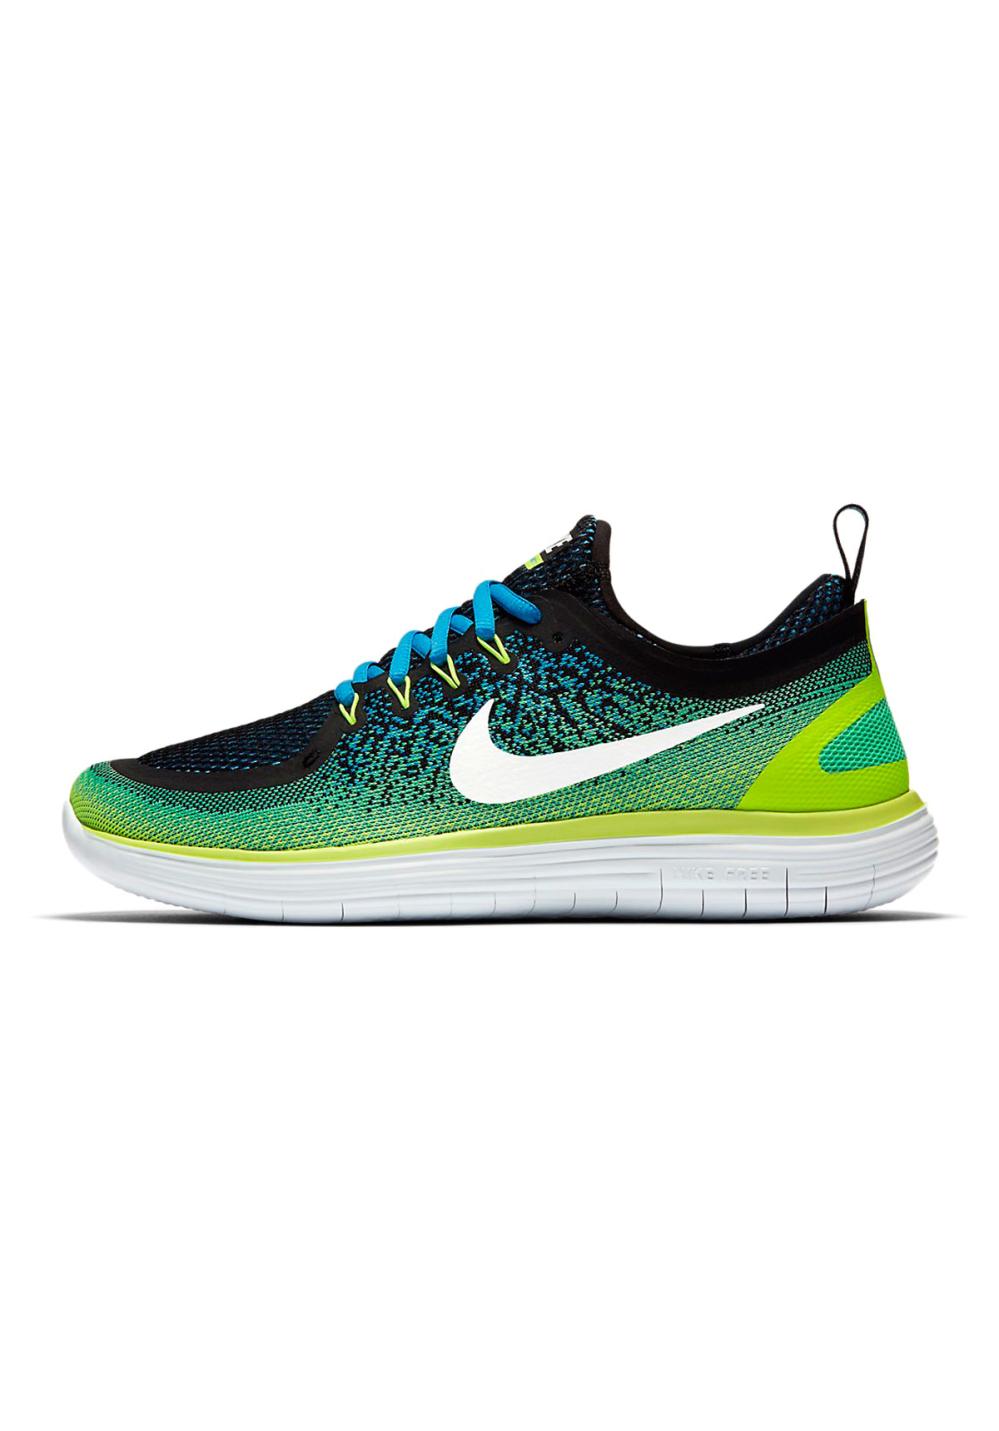 ec90fe8bd11c3 Nike Free RN Distance 2 - Running shoes for Men - Blue